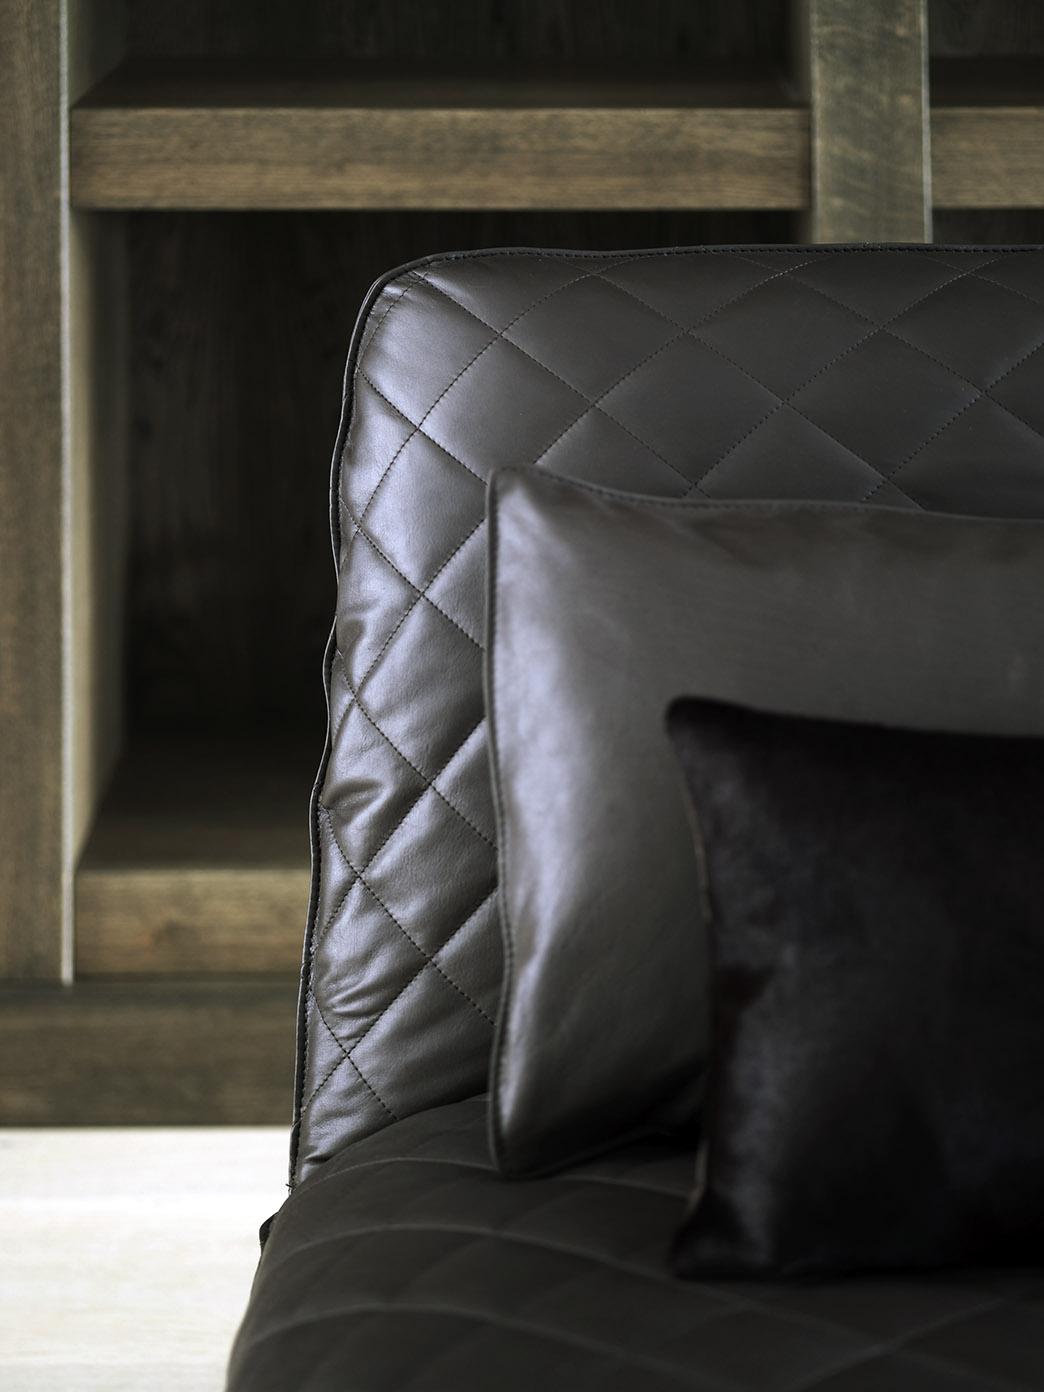 KEKKE longchair at Dutch farm house